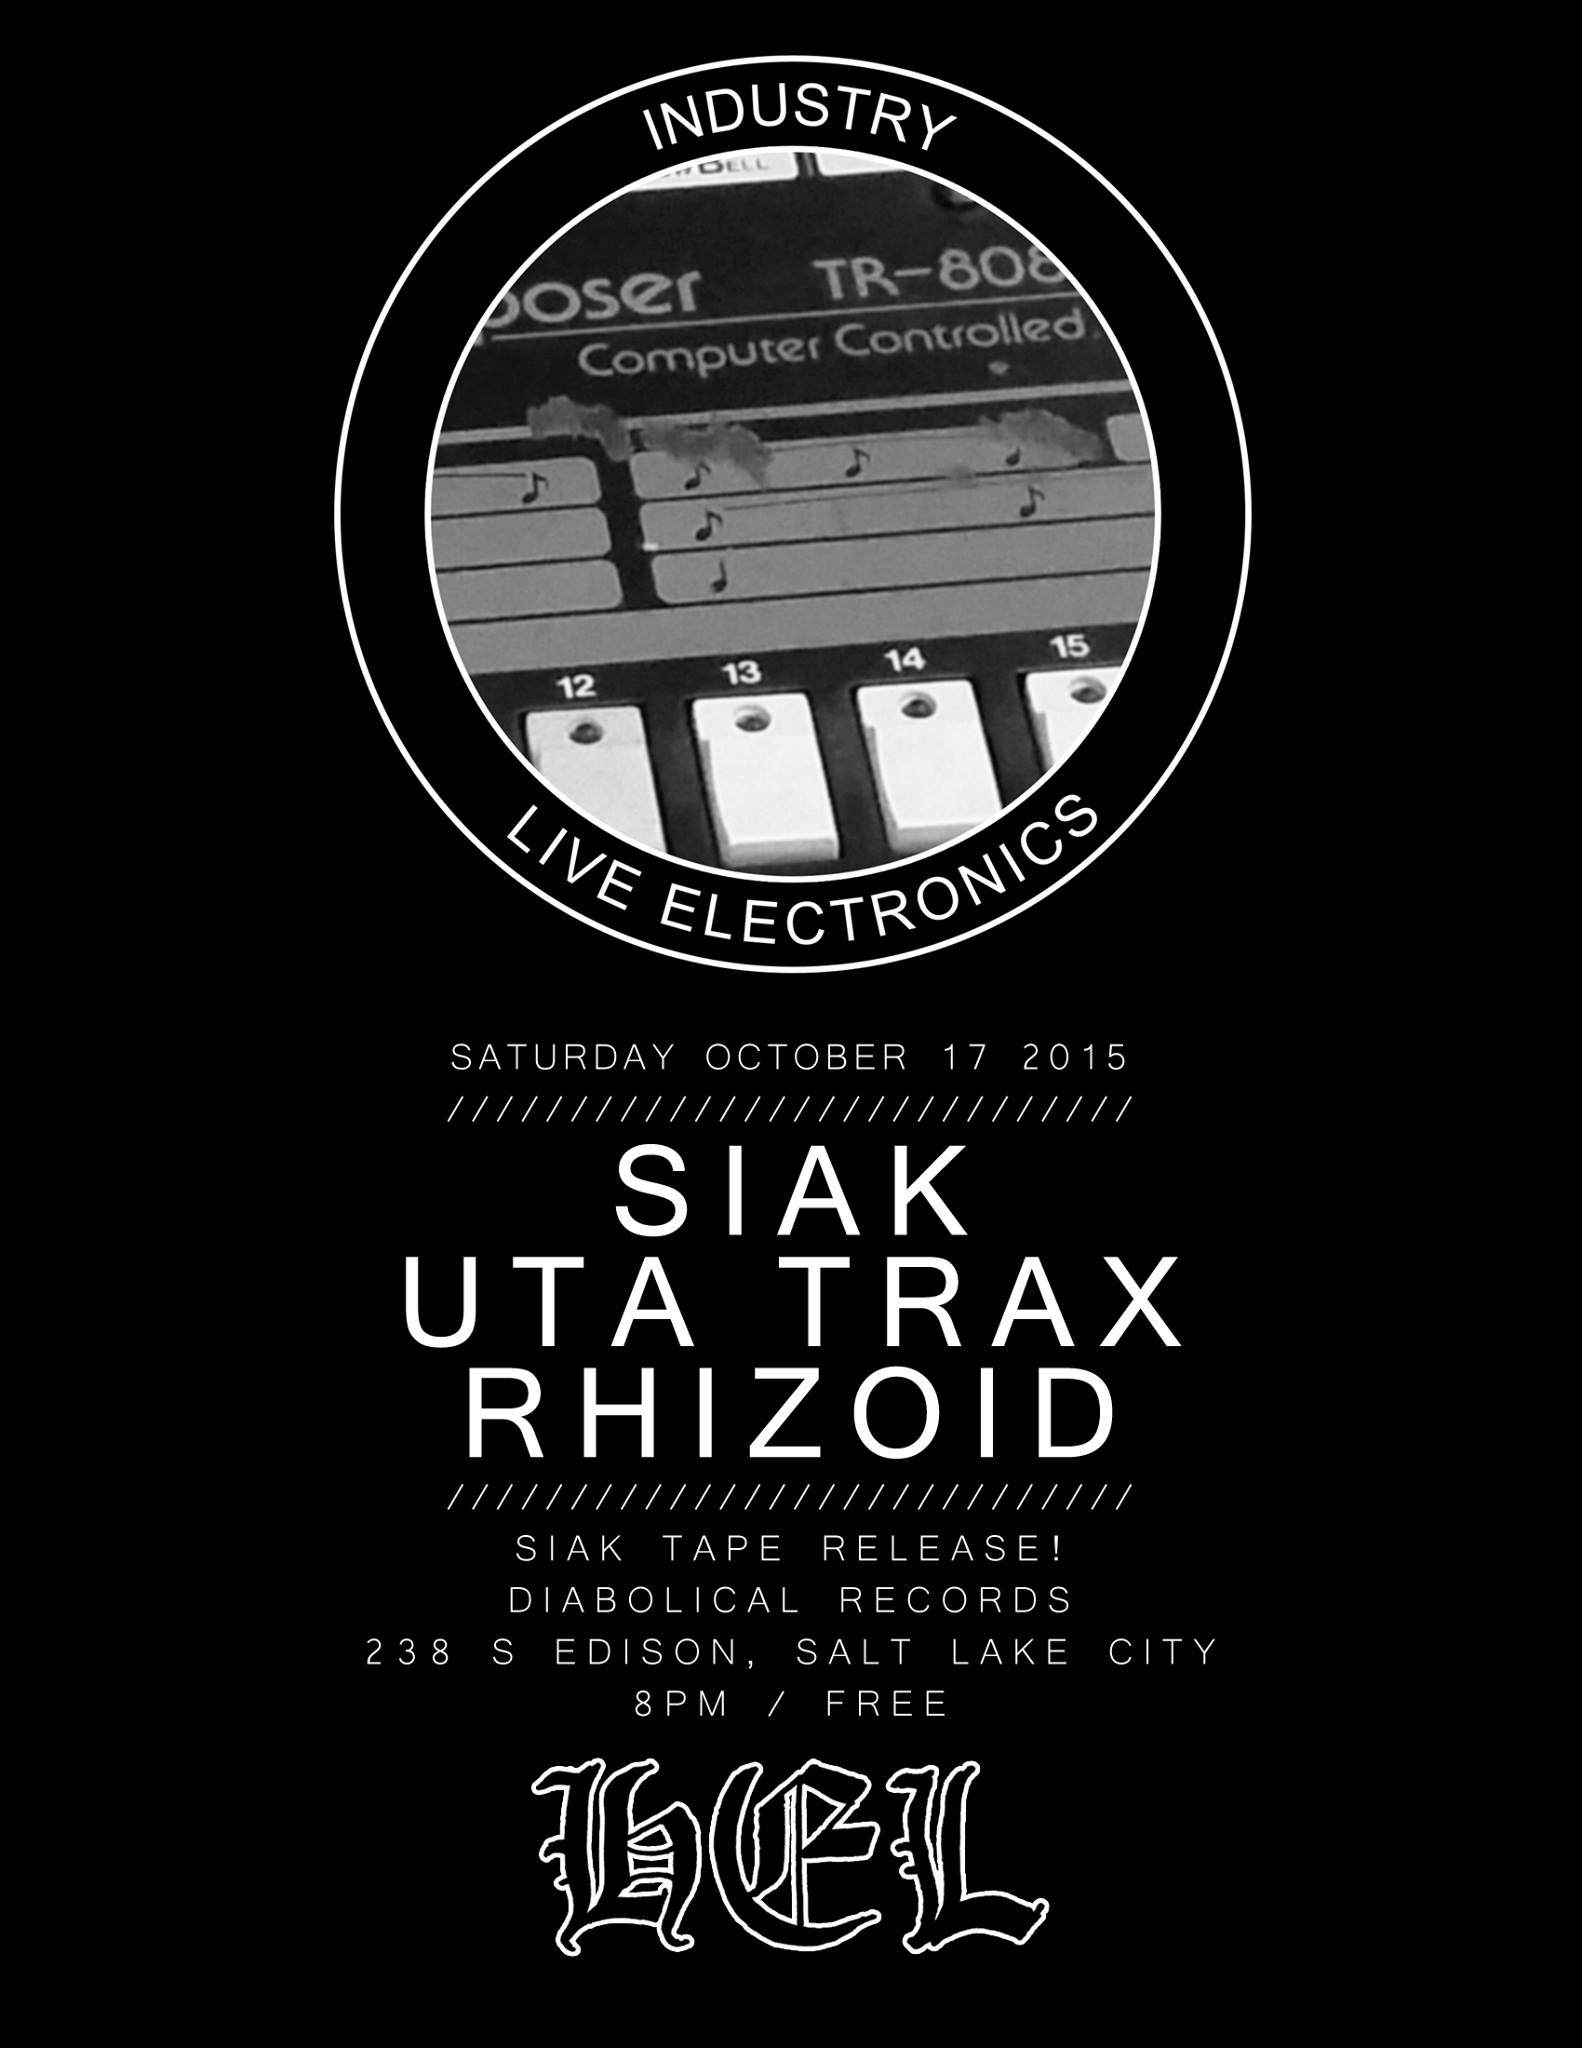 hel audio siak uta trax rhizoid diabolical records salt lake city